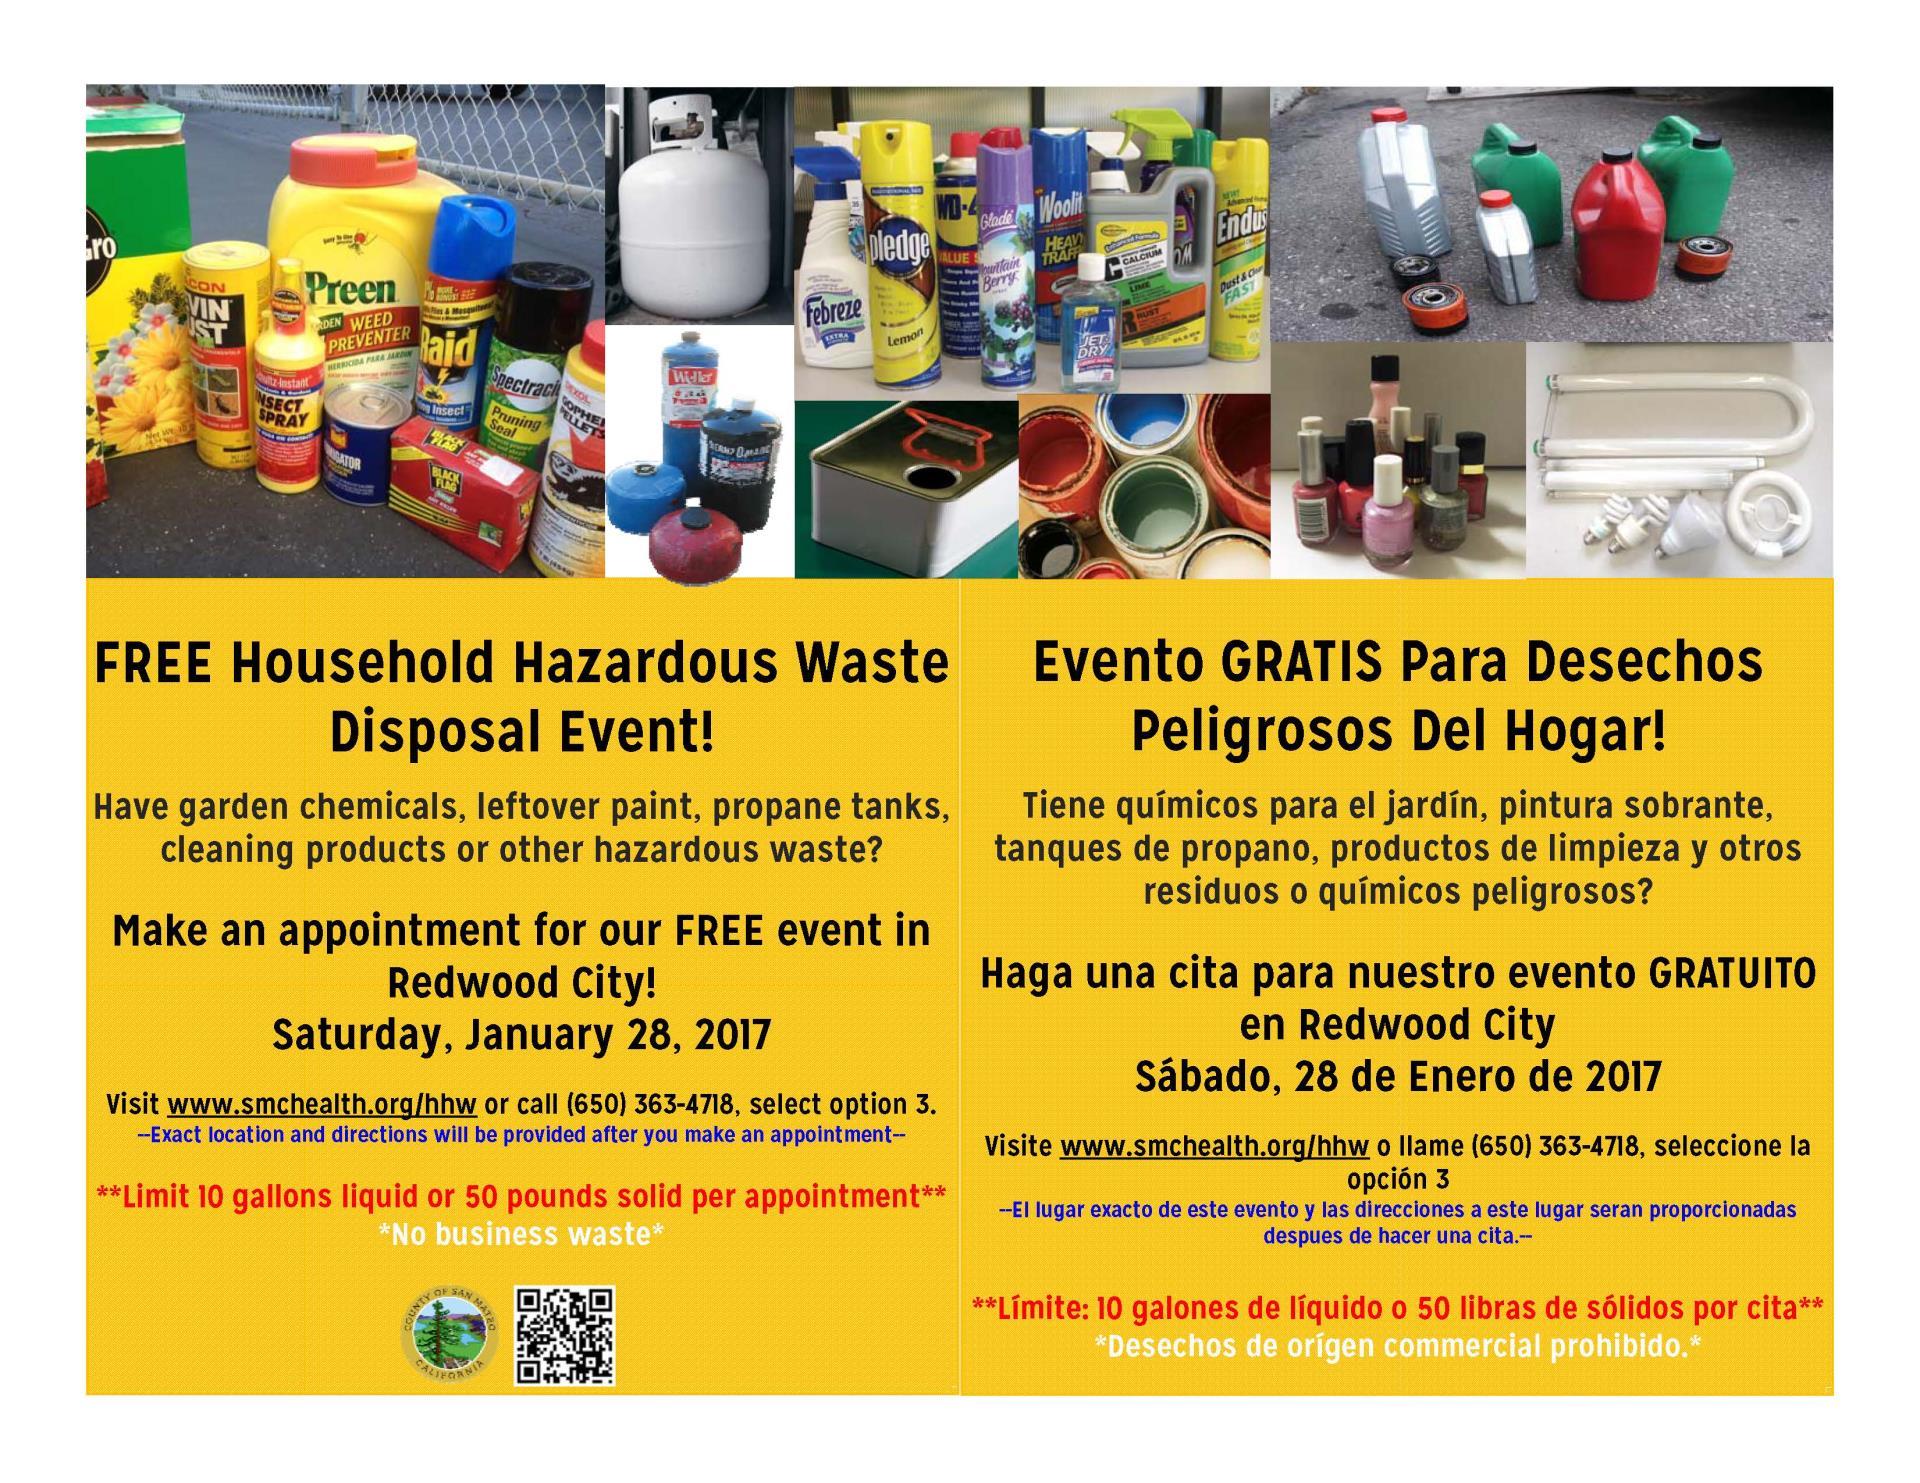 FREE Household Hazardous Waste Disposal Event! | City Events